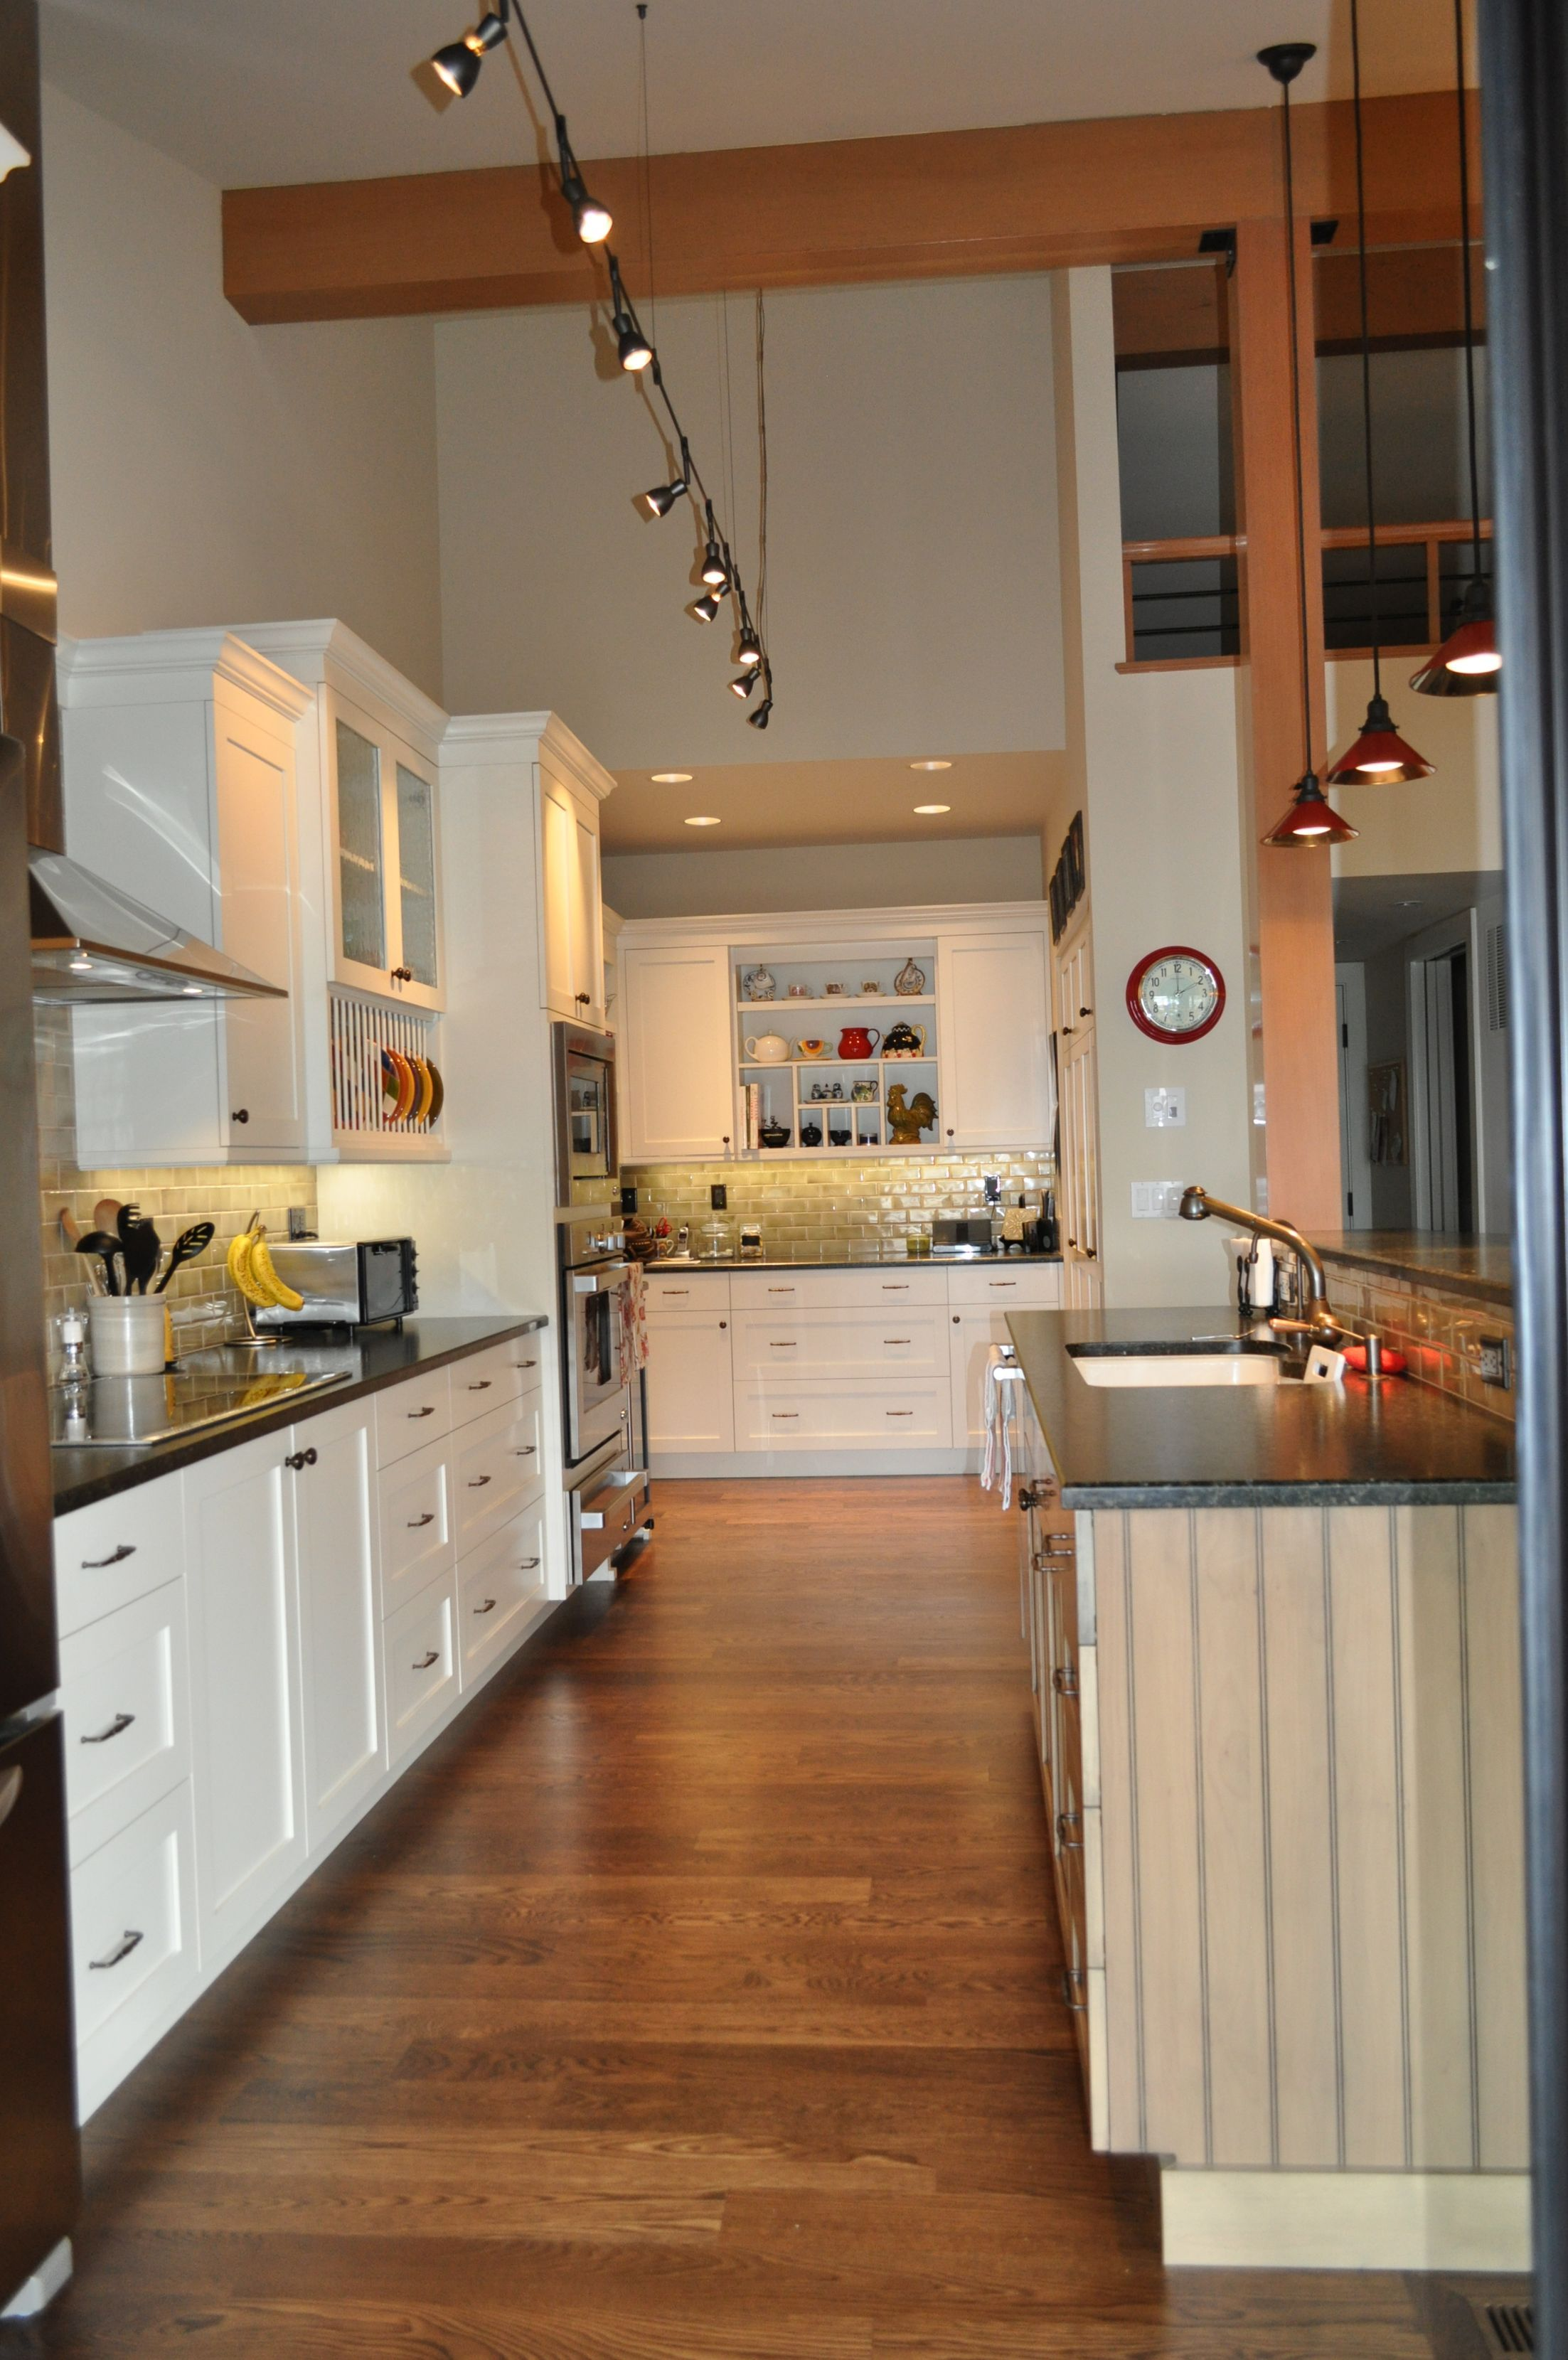 061 - Coastal - Kitchen - Images by Hamilton Redesigns | Wayfair